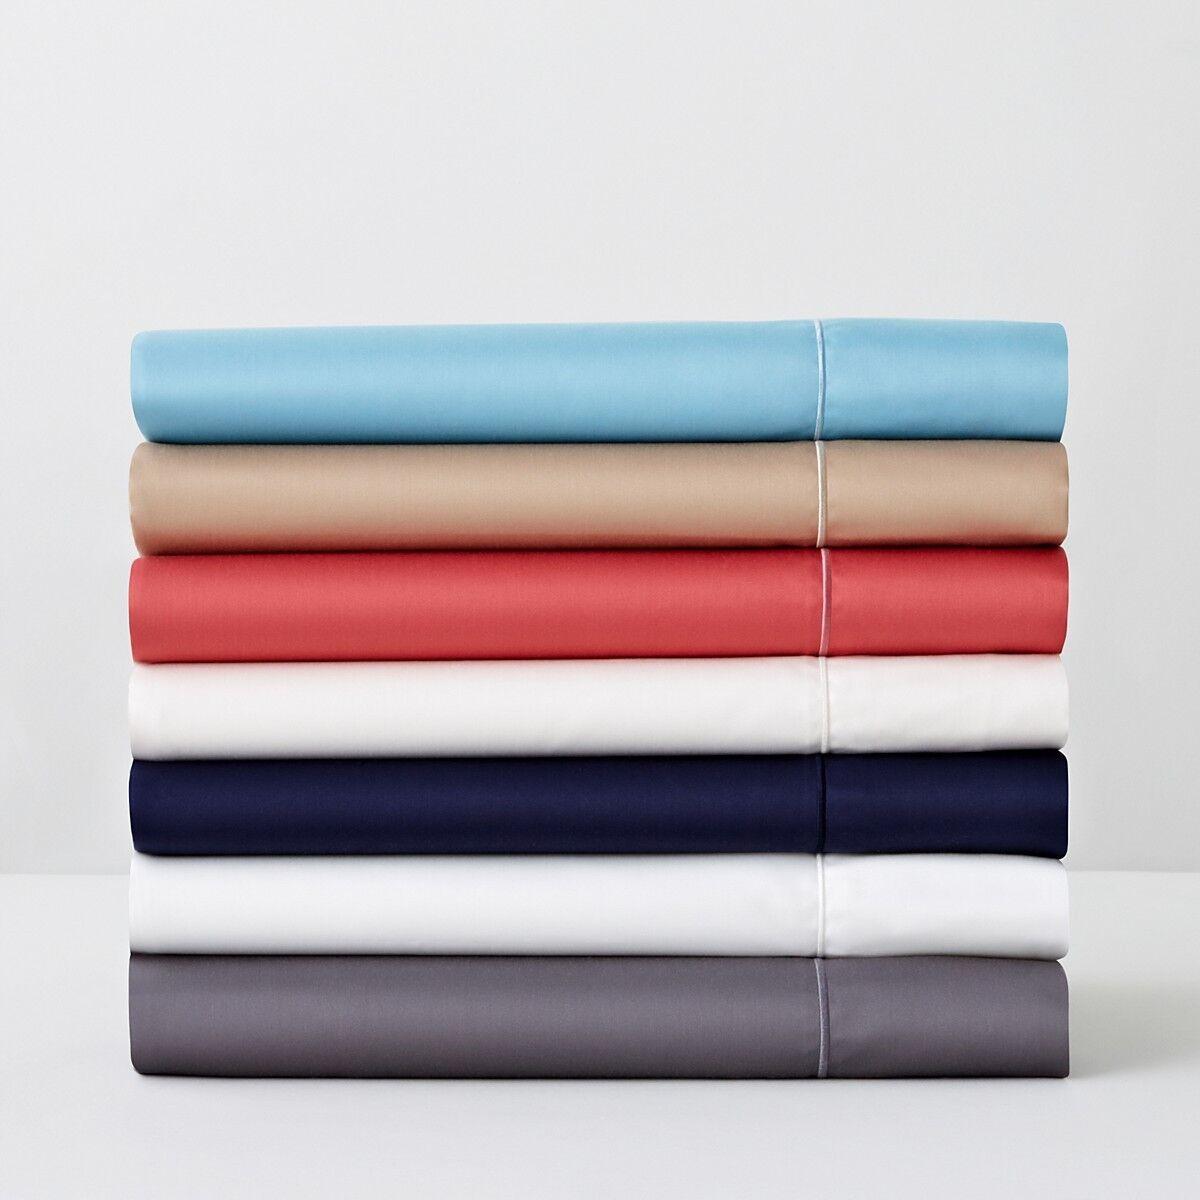 HUDSON PARK 500 Thread Count TWIN   TWIN XL Duvet Cover AZURE blueE Y343